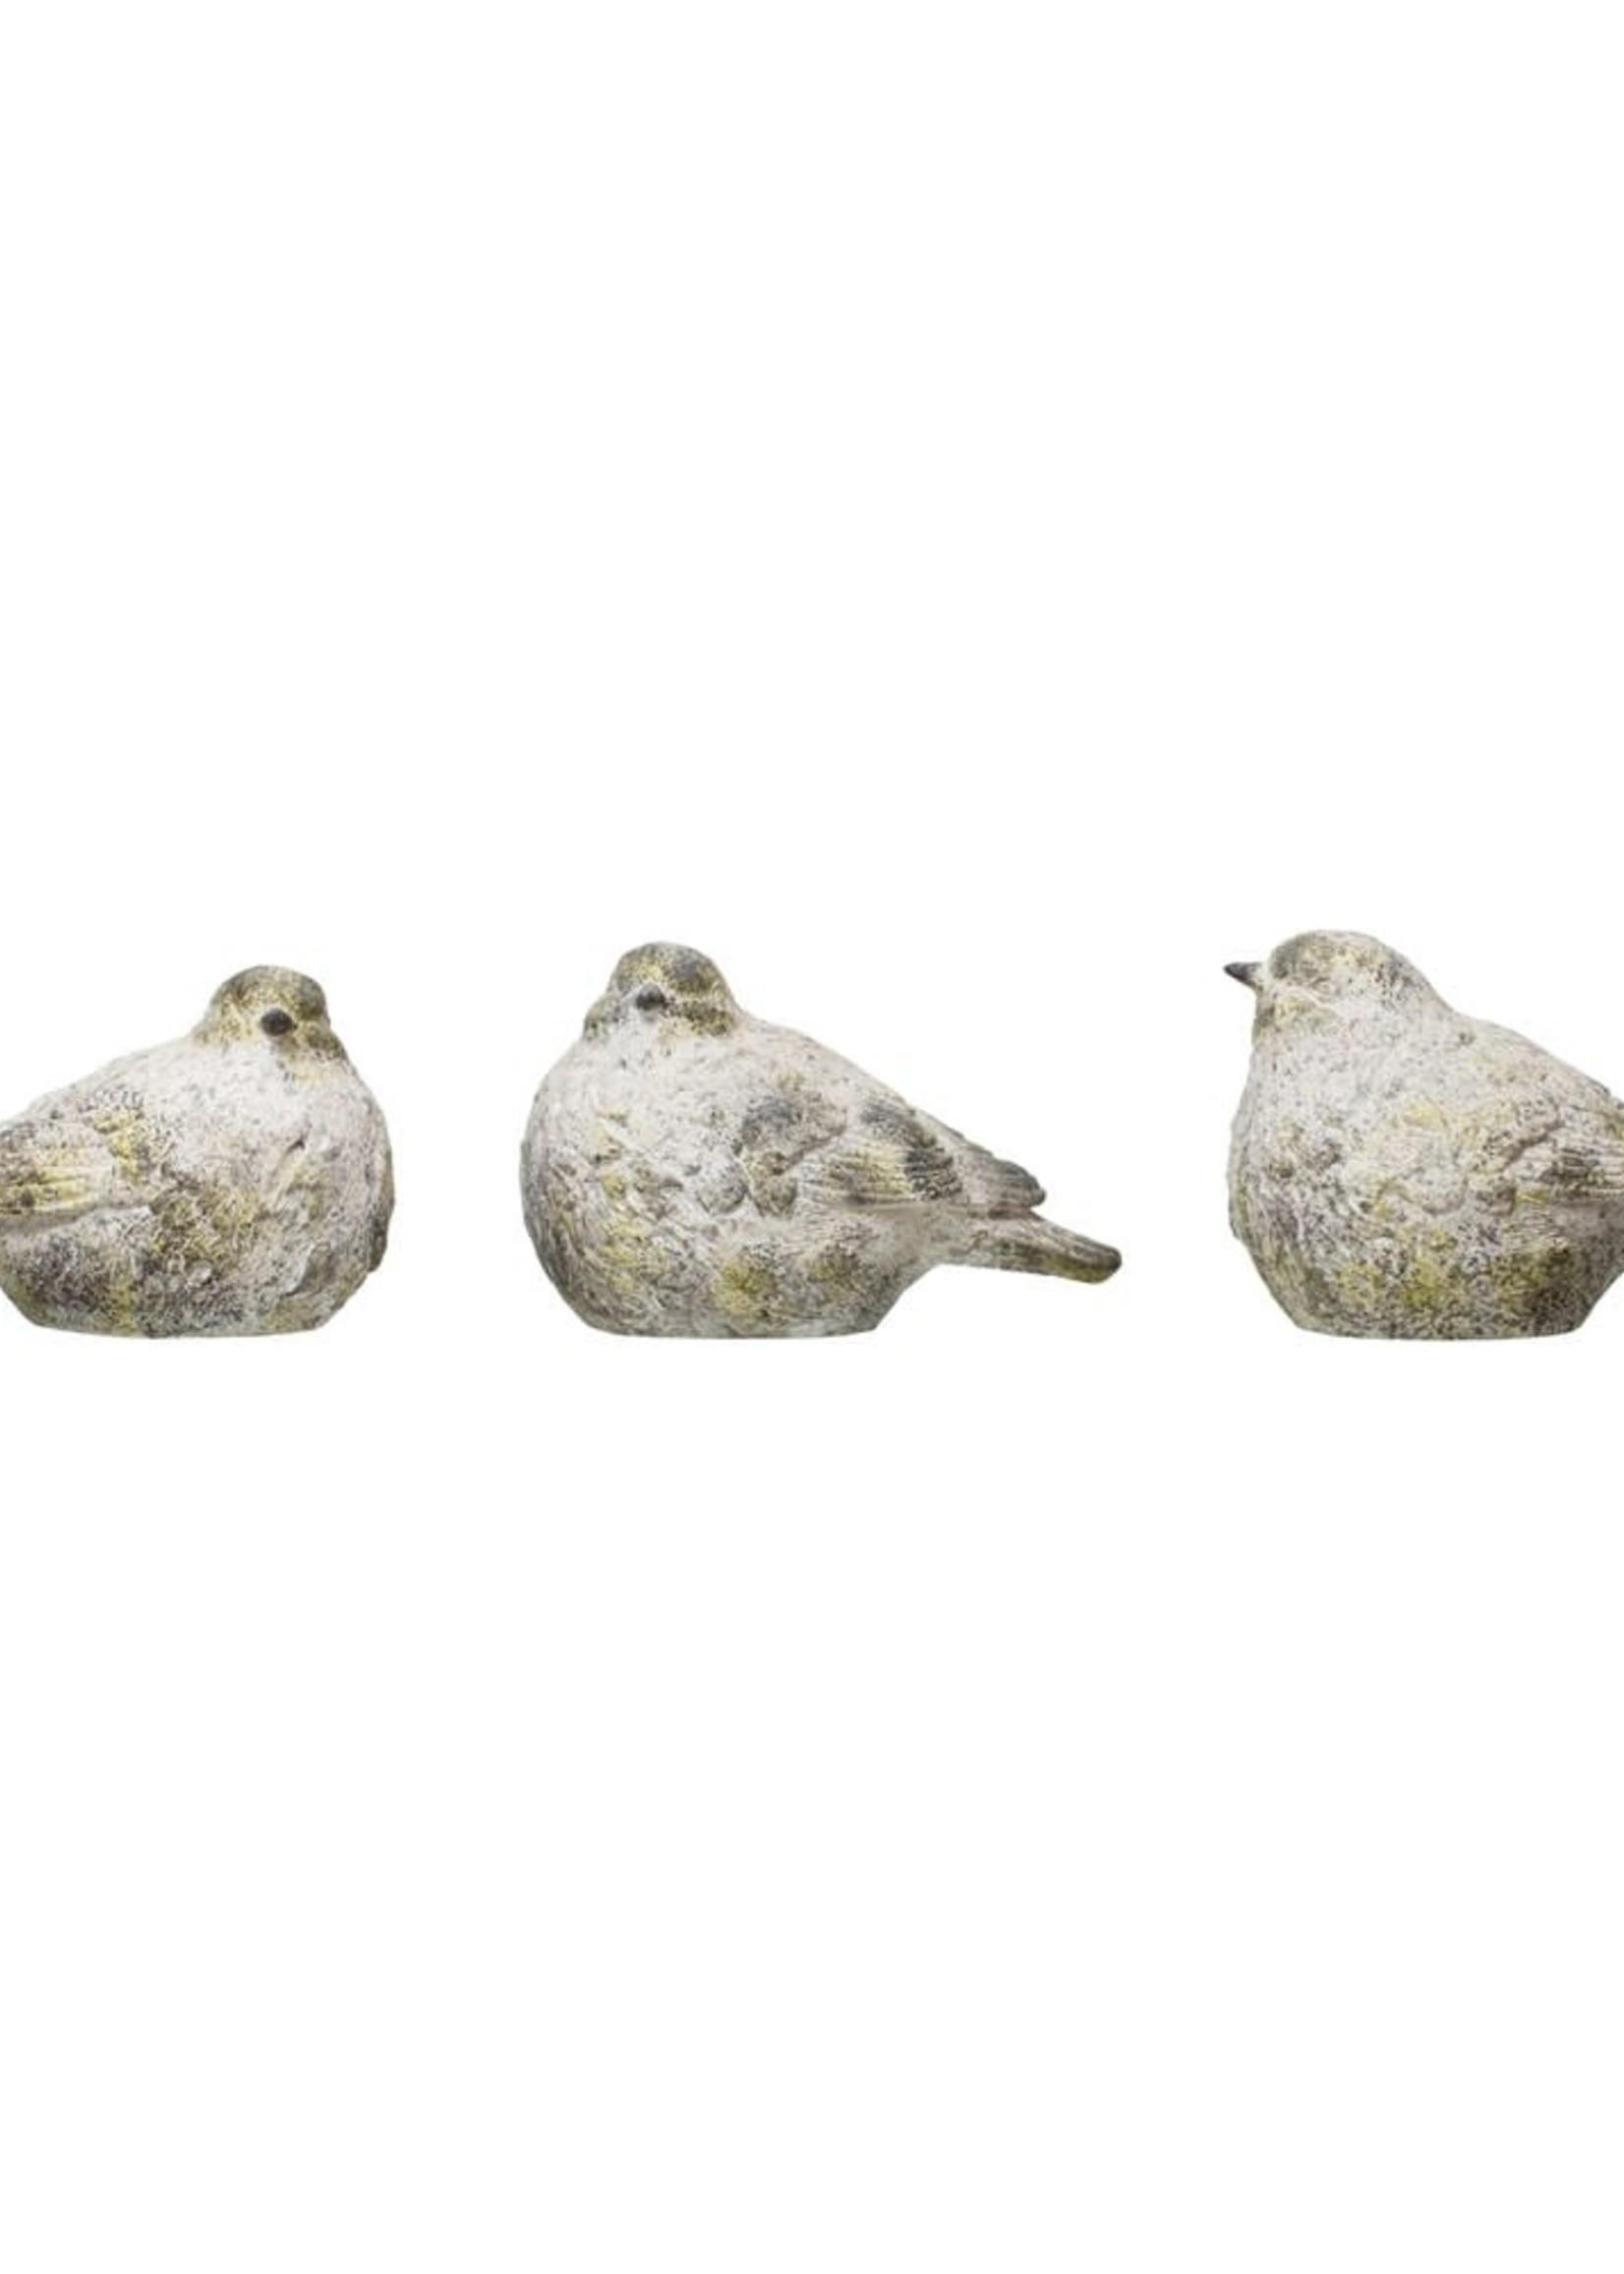 Resin Bird, Cement Moss Finish, 3 Styles